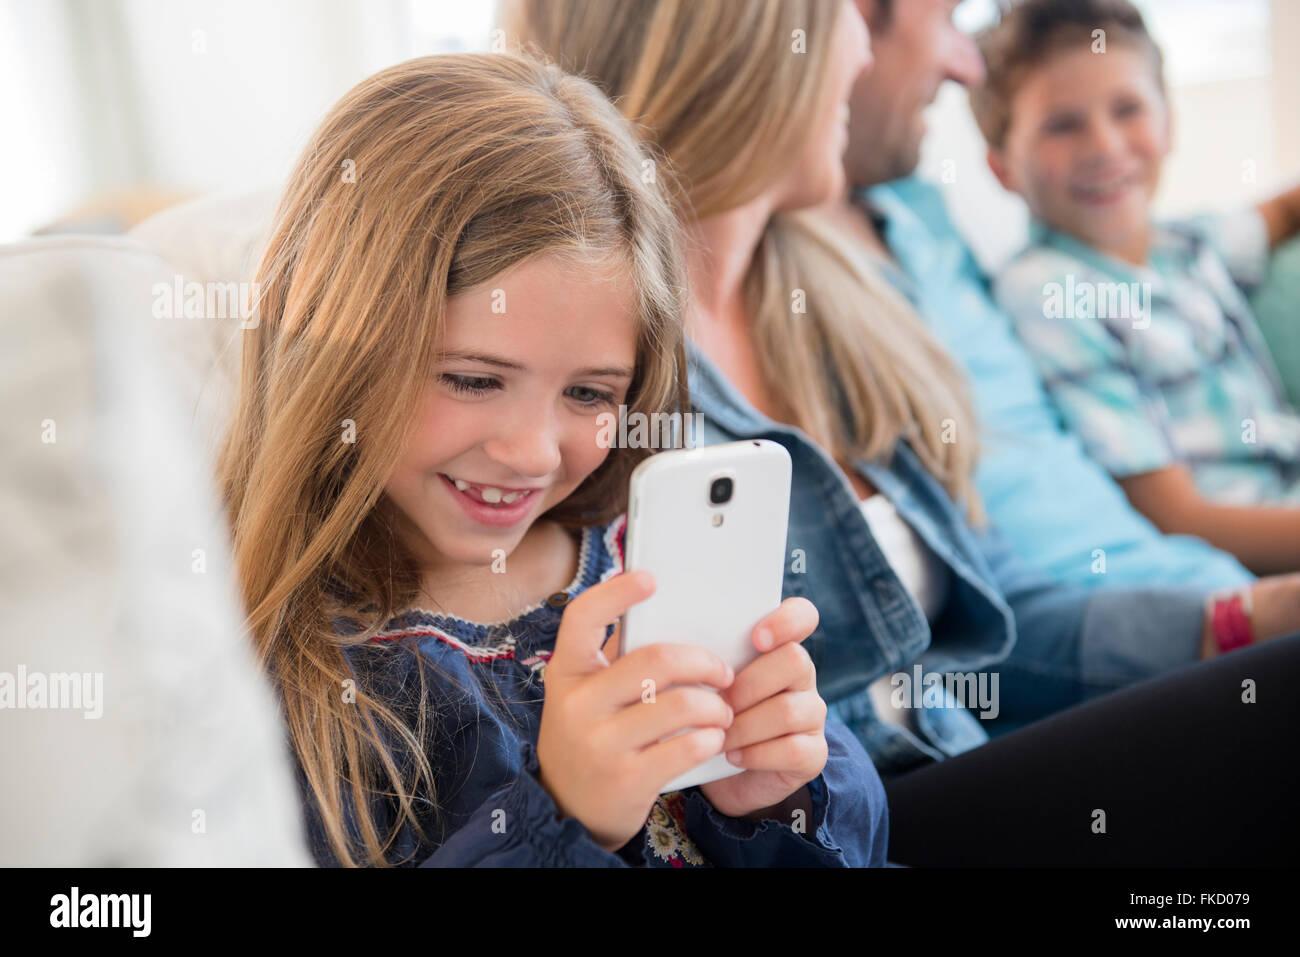 Girl (6-7) sitting on sofa, using smart phone - Stock Image